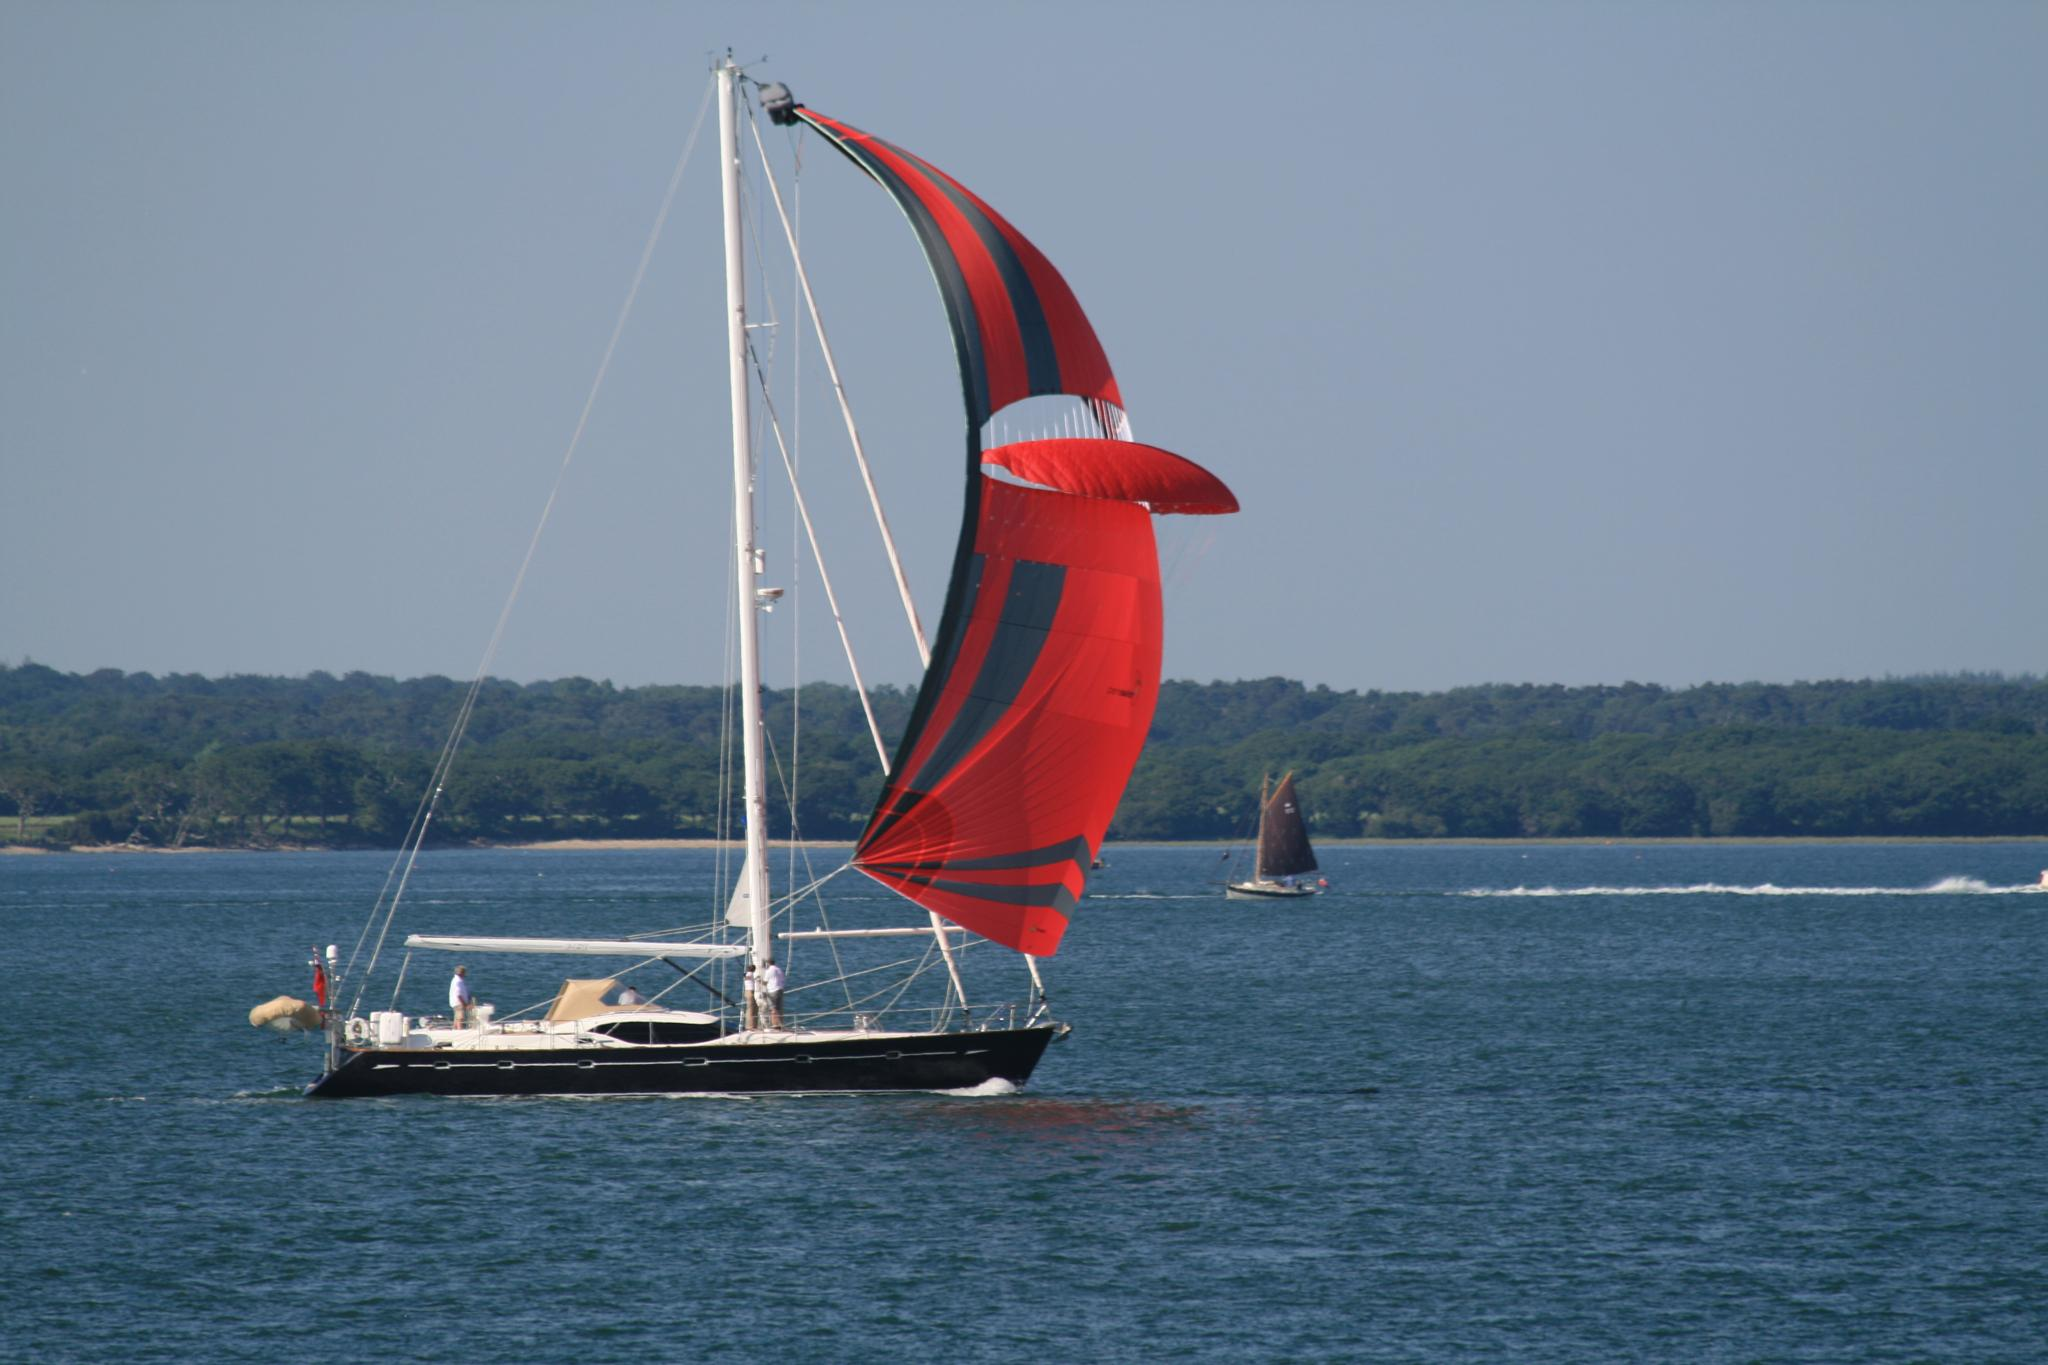 Plain Sailing by keith.markillie